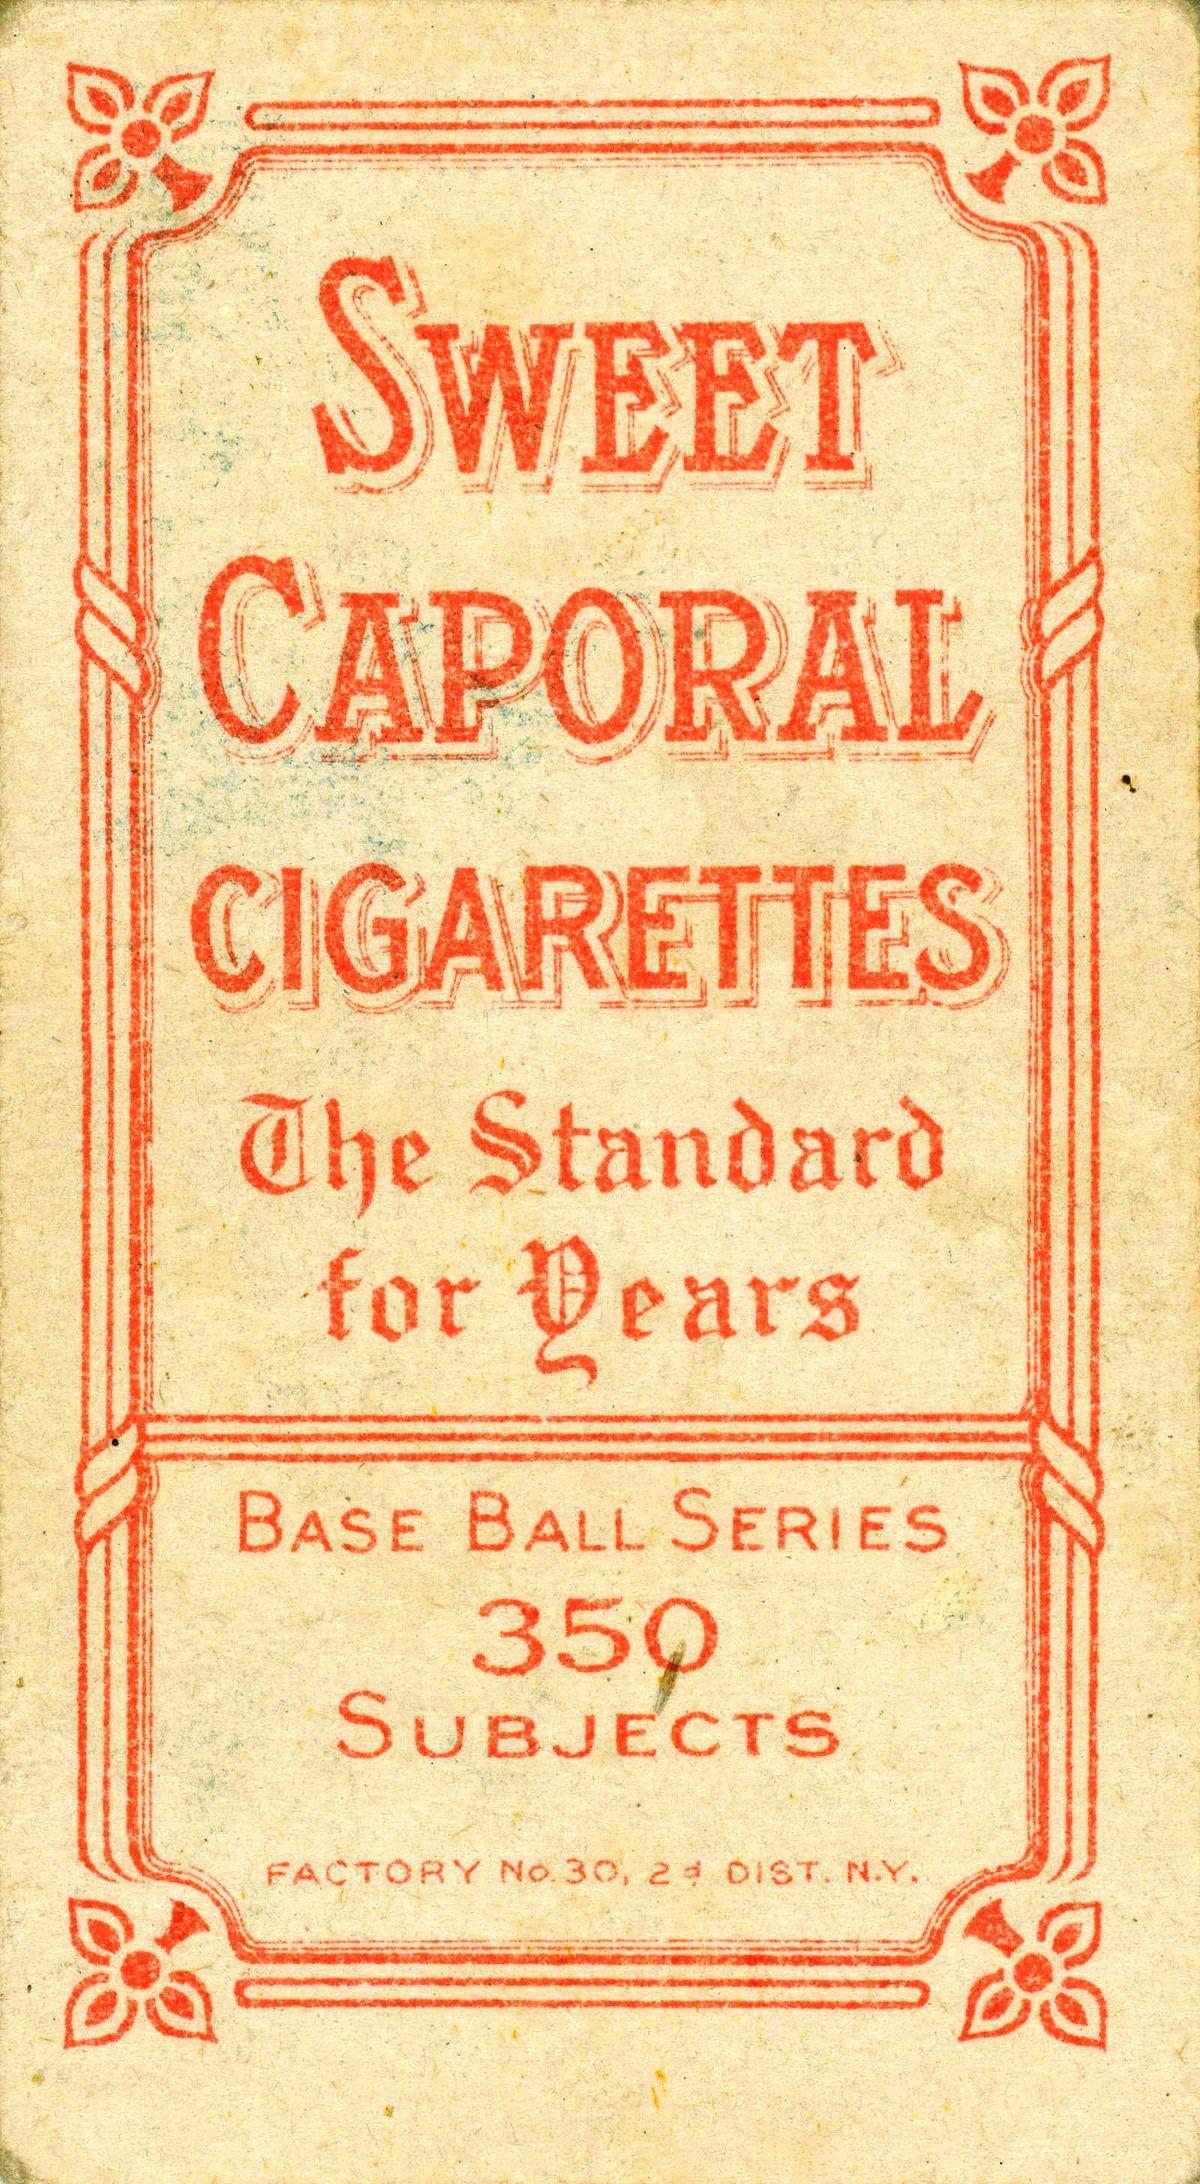 kinney brothers tobacco company